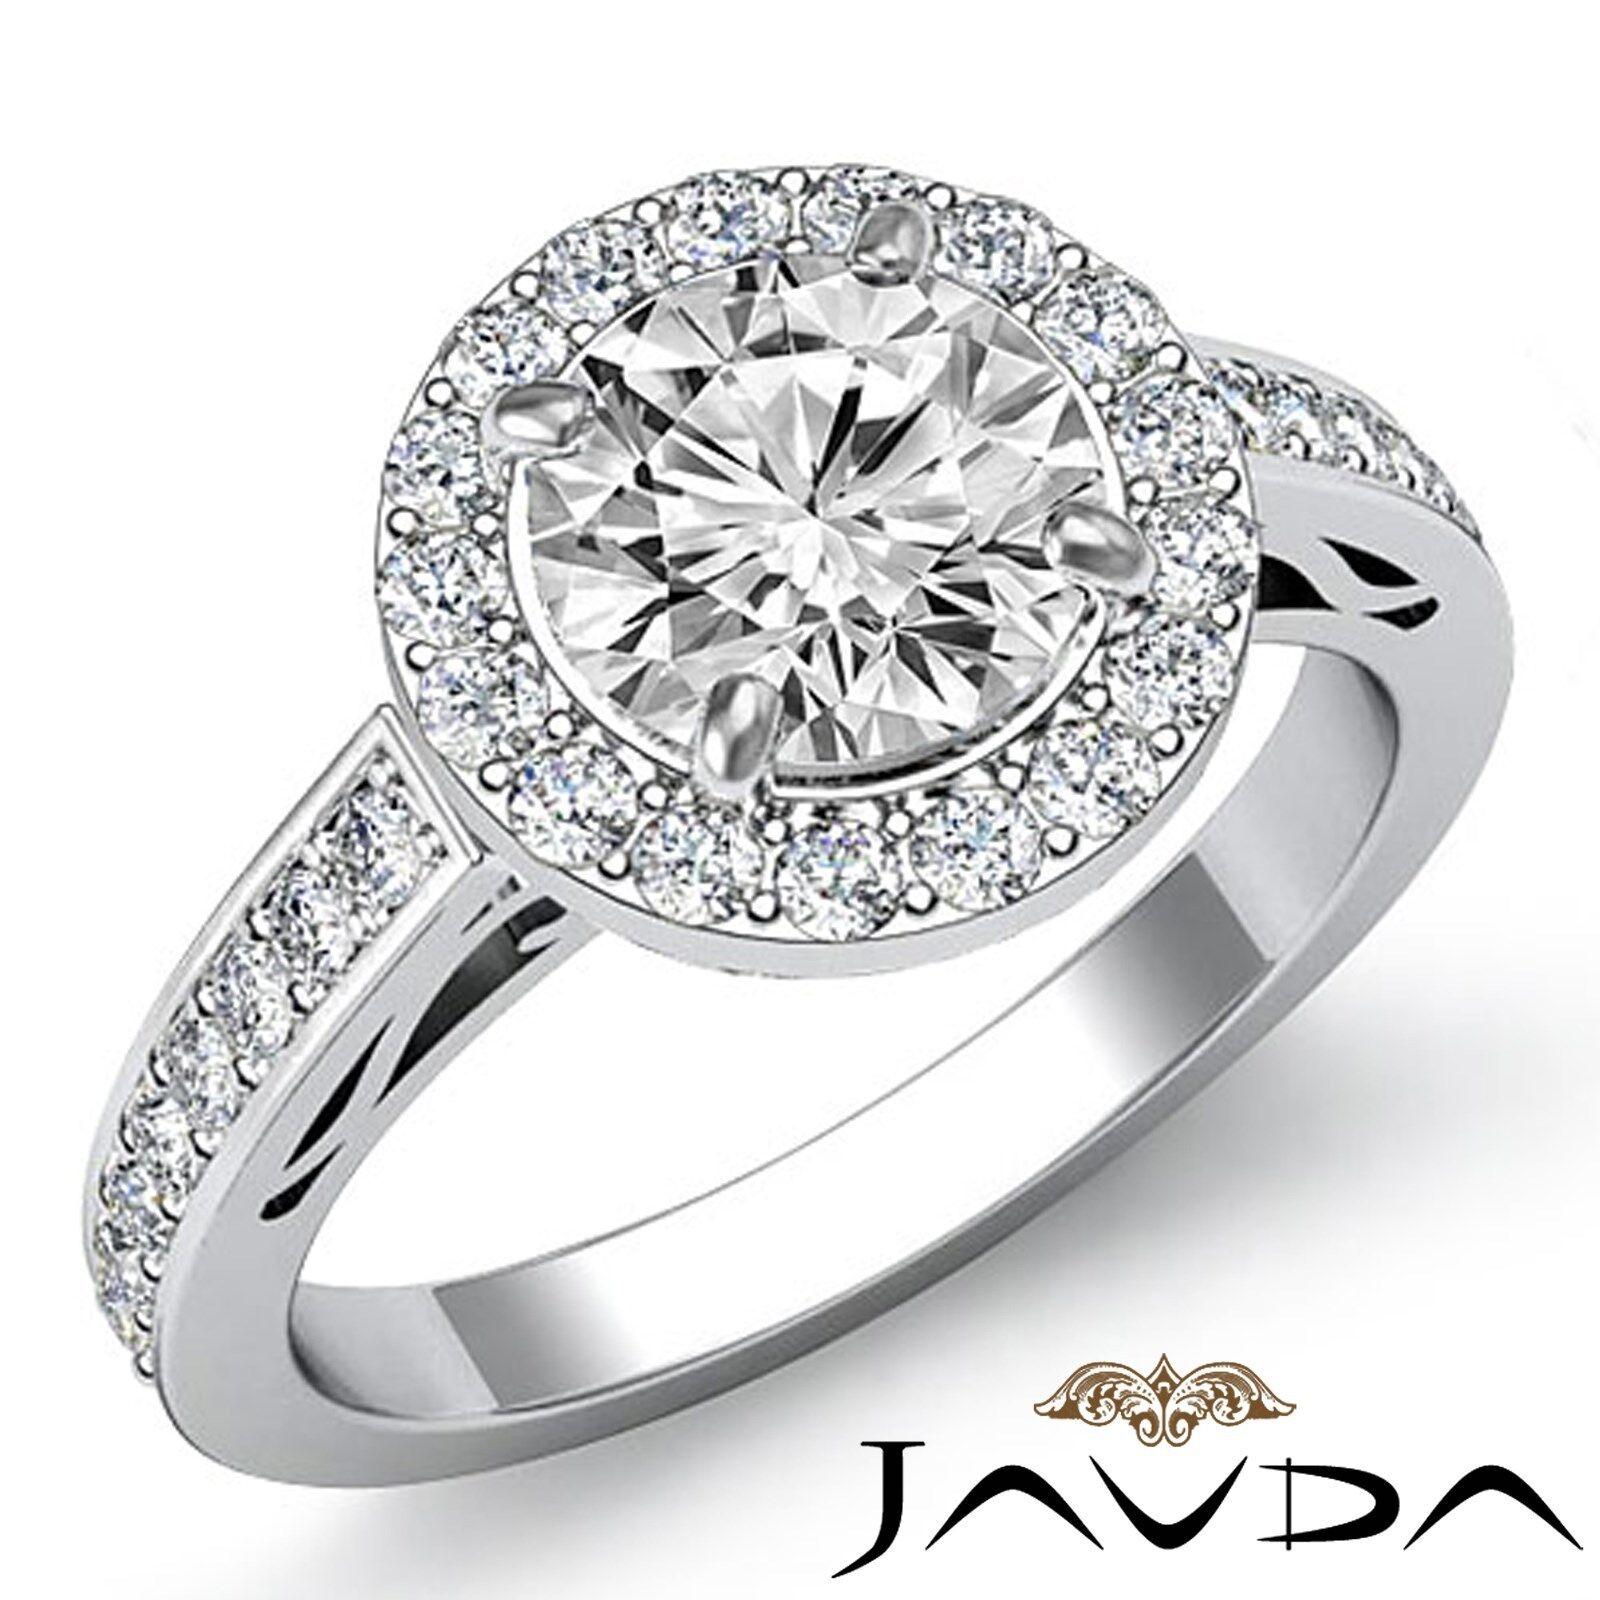 Micro Pave Filigree Halo Round Natural Diamond Engagement Ring GIA I VS2 2.8 Ct